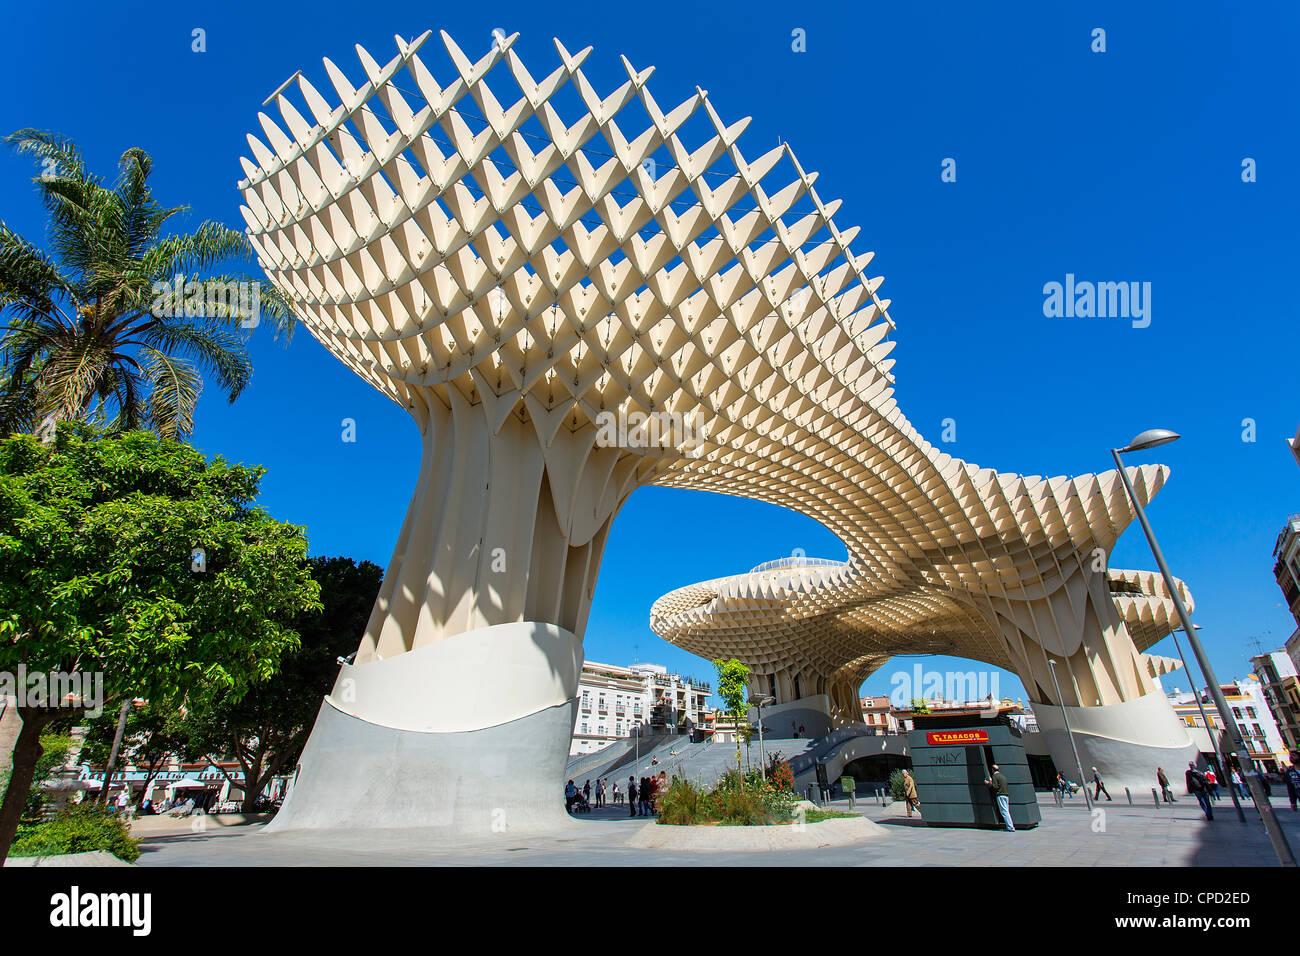 Metropol Parasol, Séville, J. Mayer H Architectes, Photo Stock